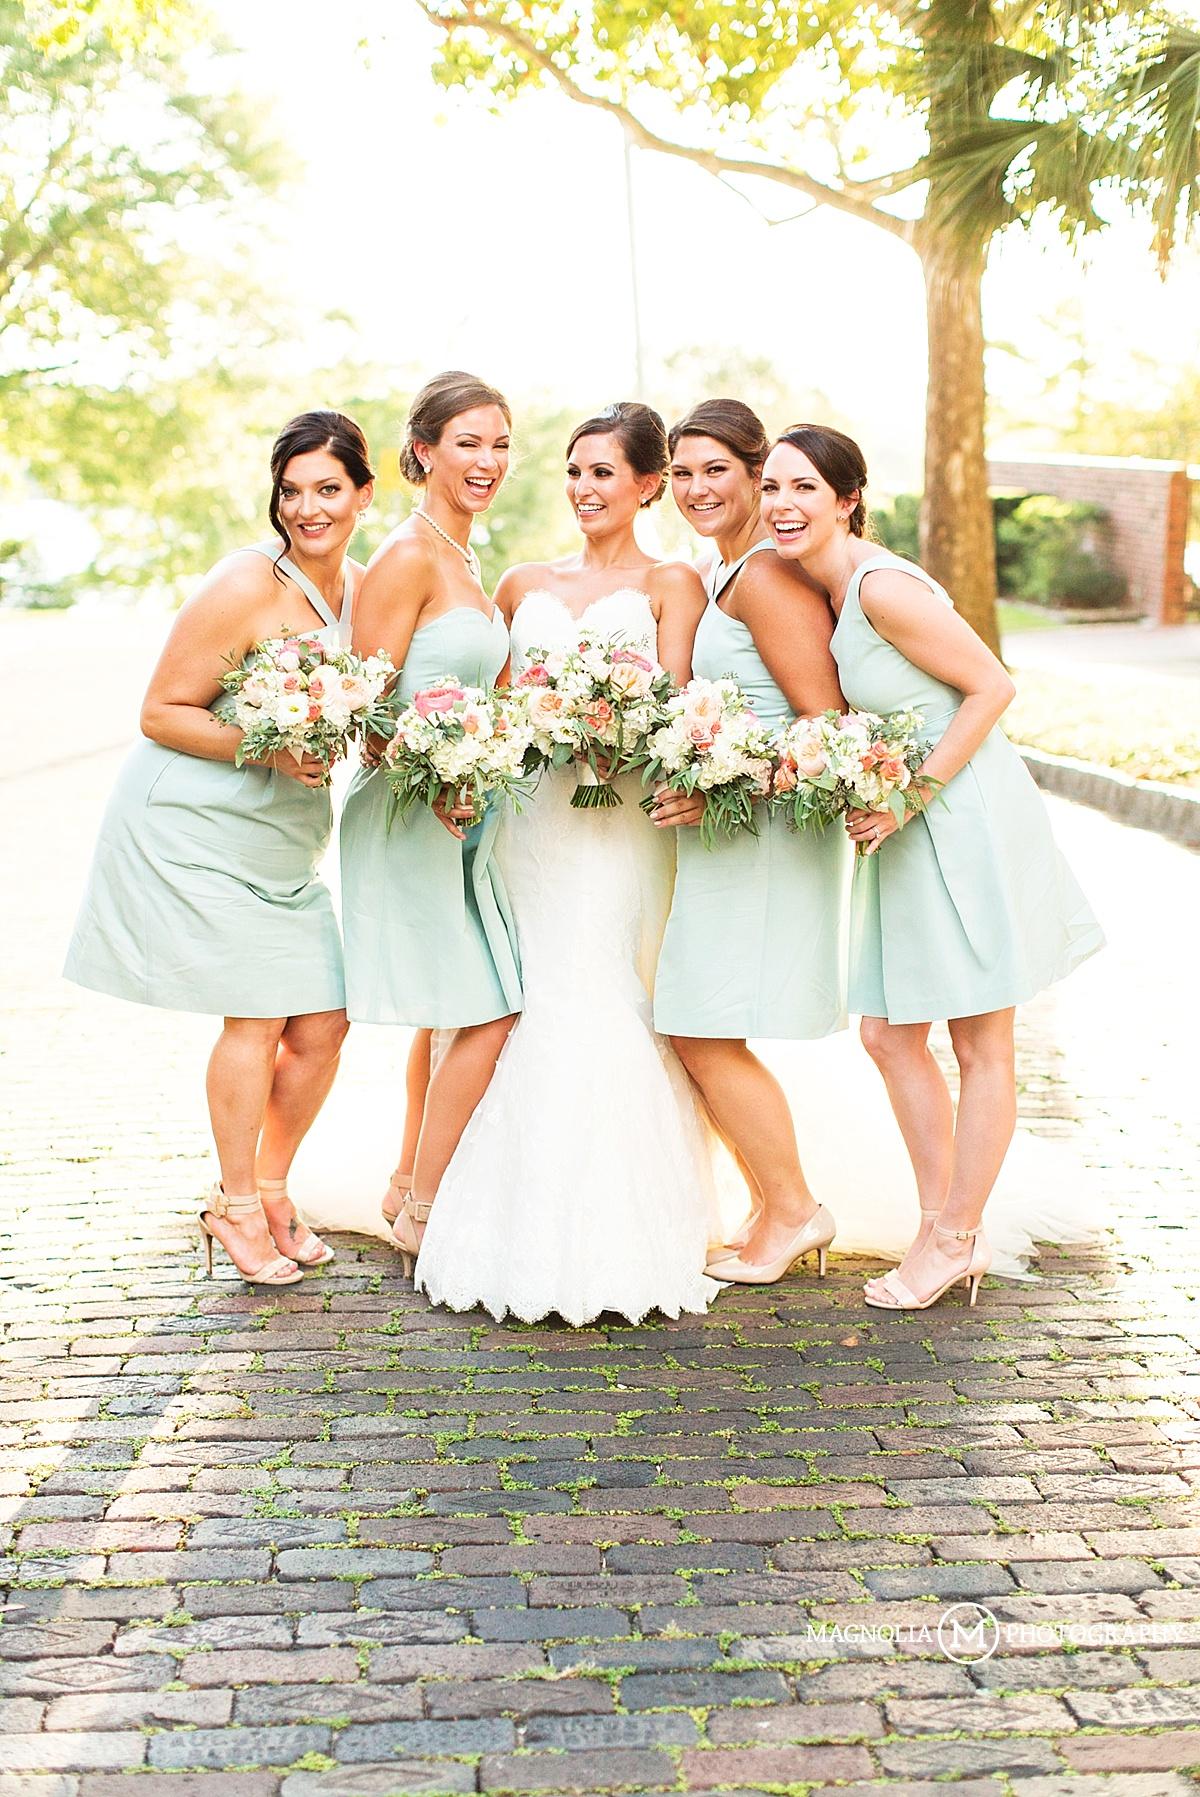 weddings at brooklyn arts center-53-1